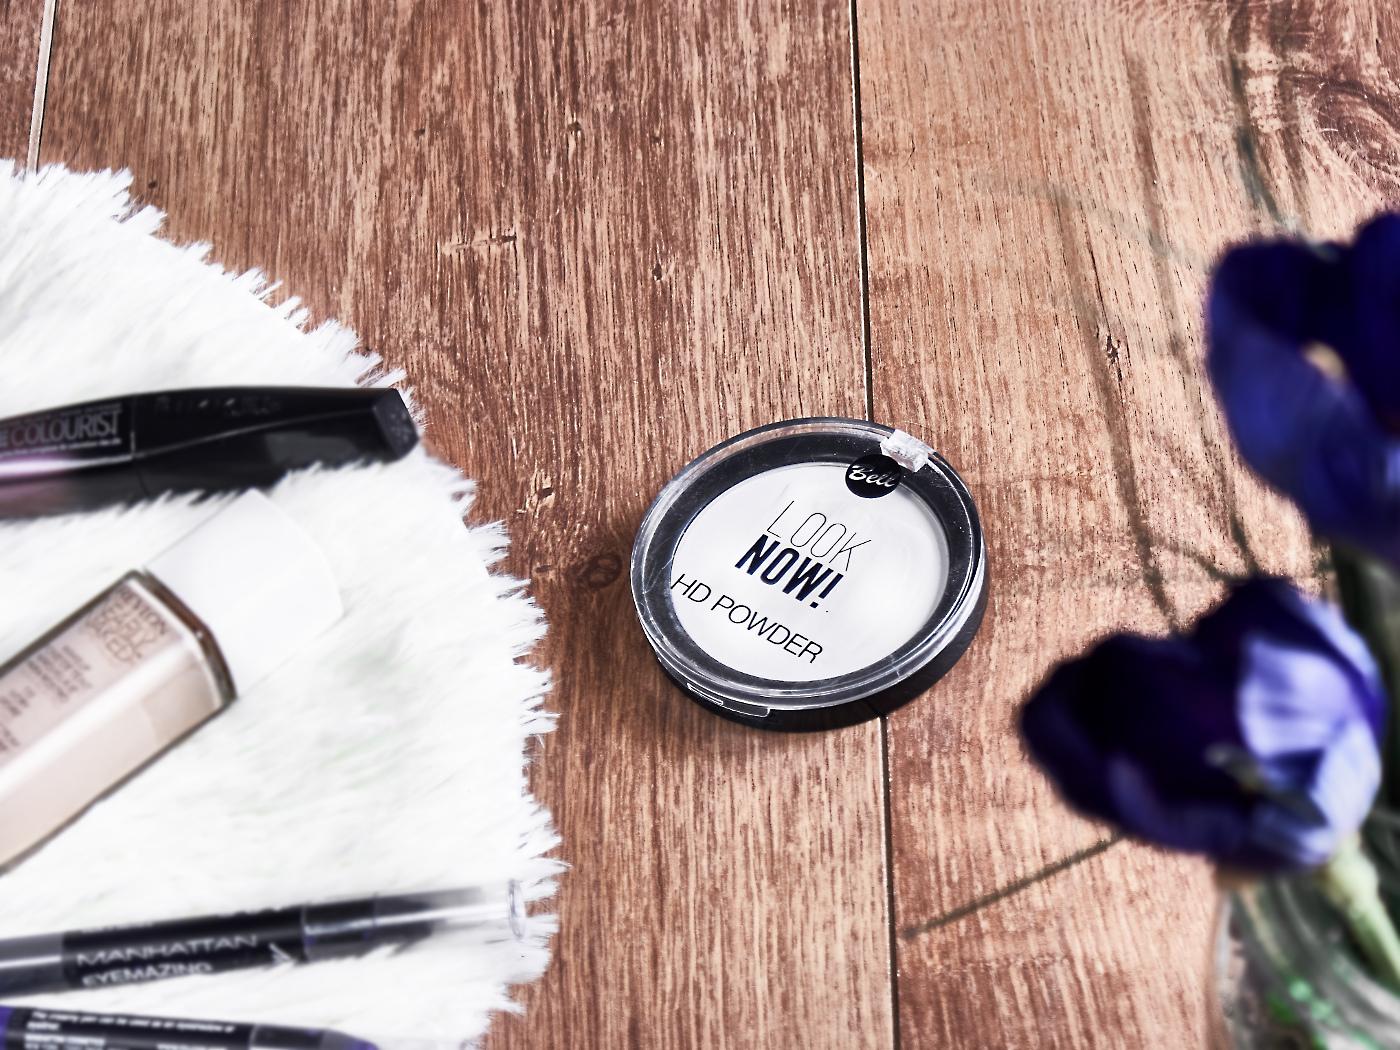 Rimmel Volume Colourist, Lirene Shiny Touch rozświetlacz, Revlon Nearly Naked, Bell Look Now HD Powder, Manhattan Eyemazing